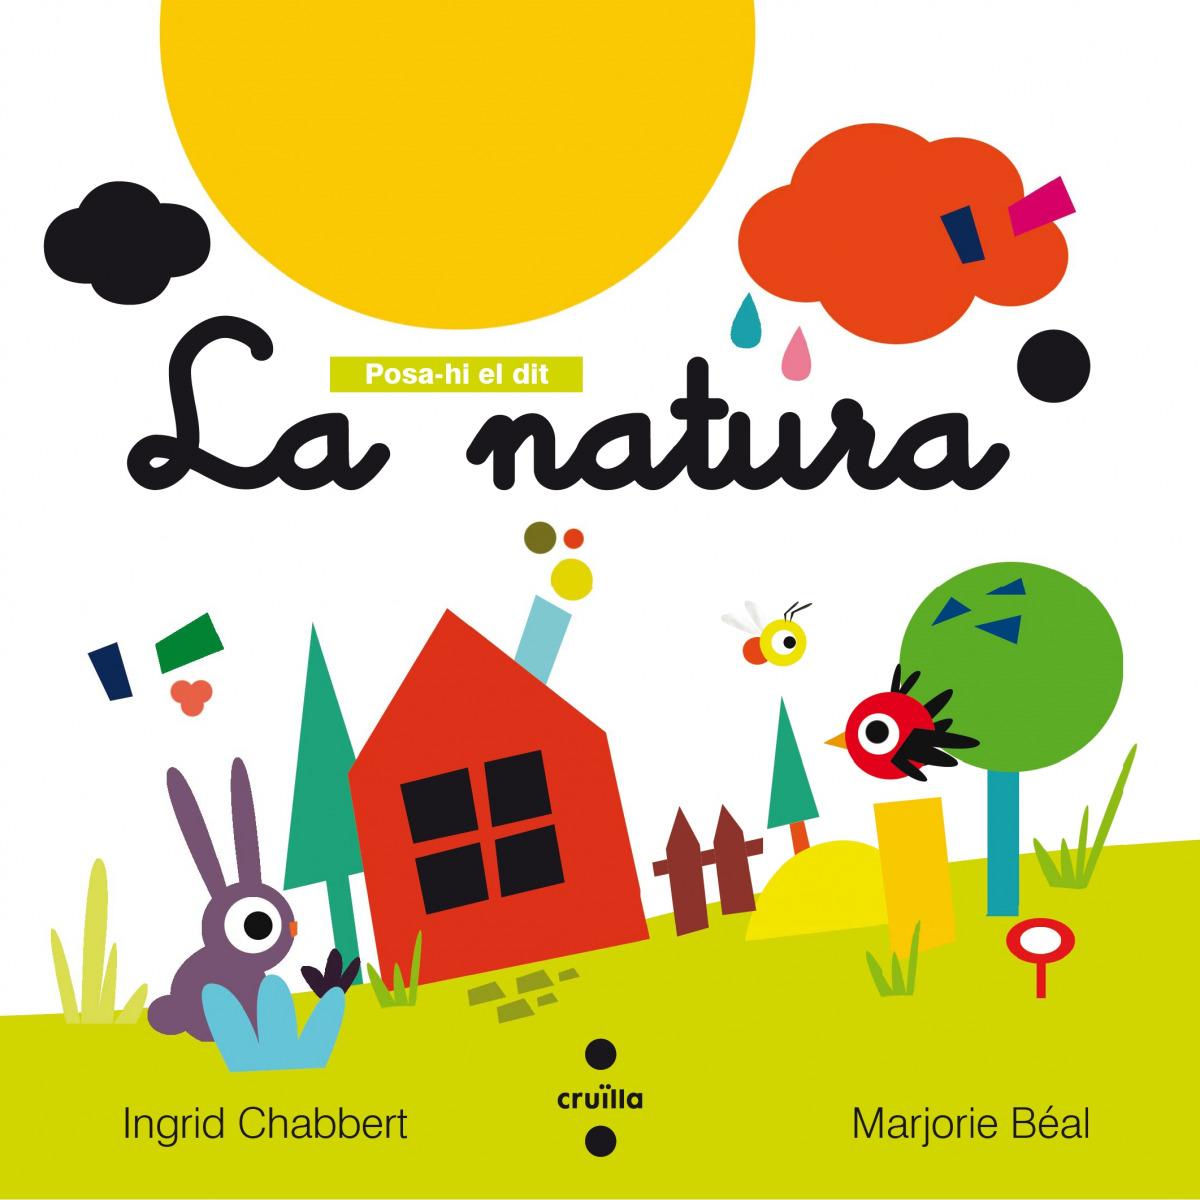 La Natura - - Chabbert, Ingrid - Imosver